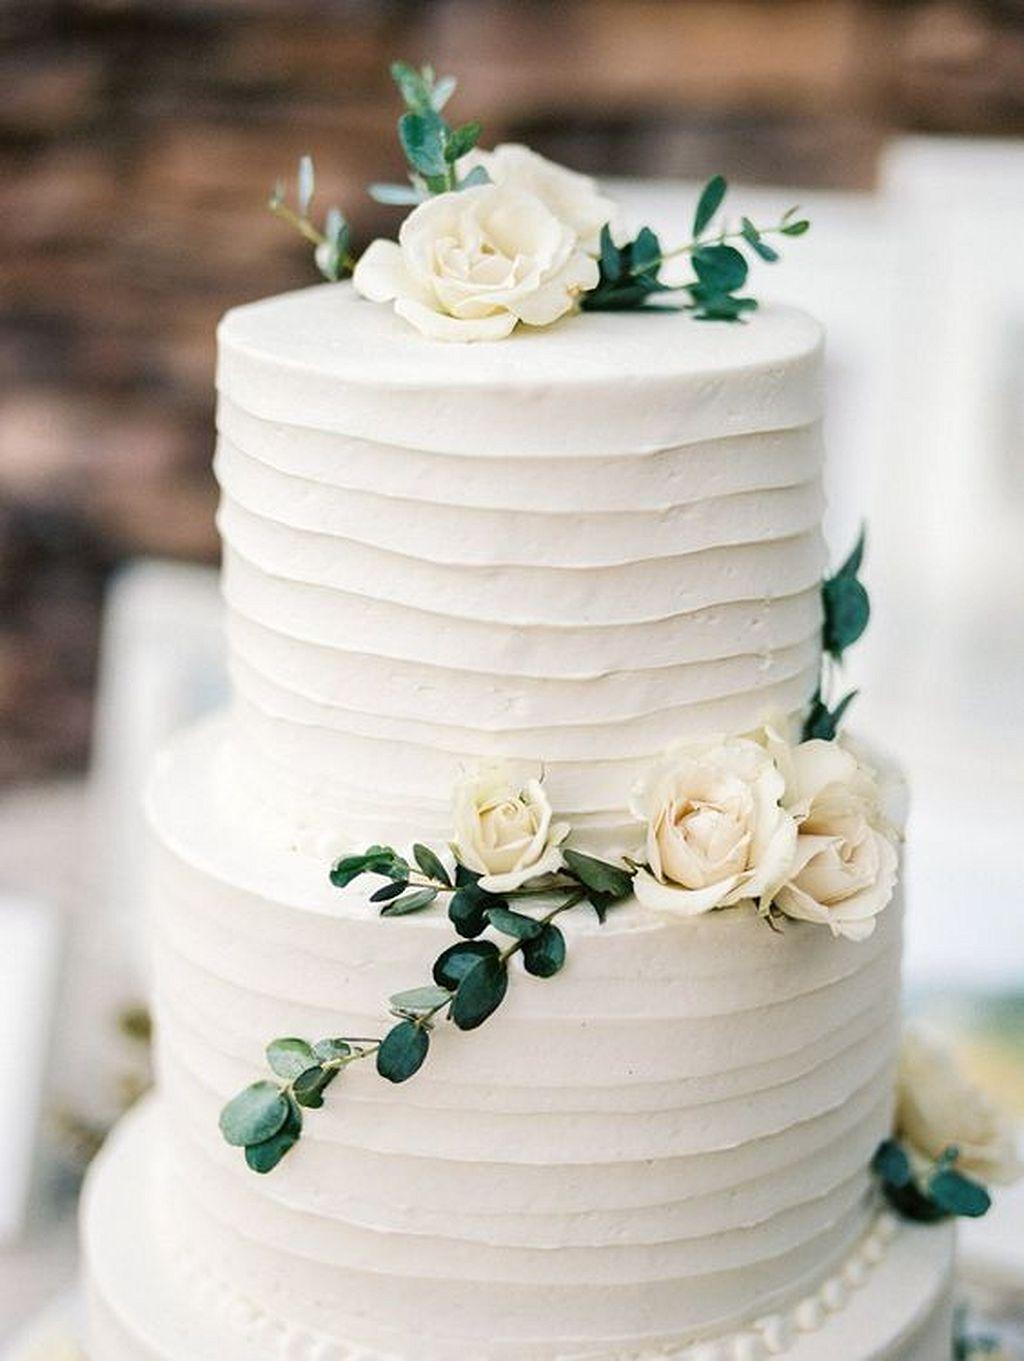 60+ Love Greenery Wedding Cake Ideas | Pinterest | Greenery, Wedding ...